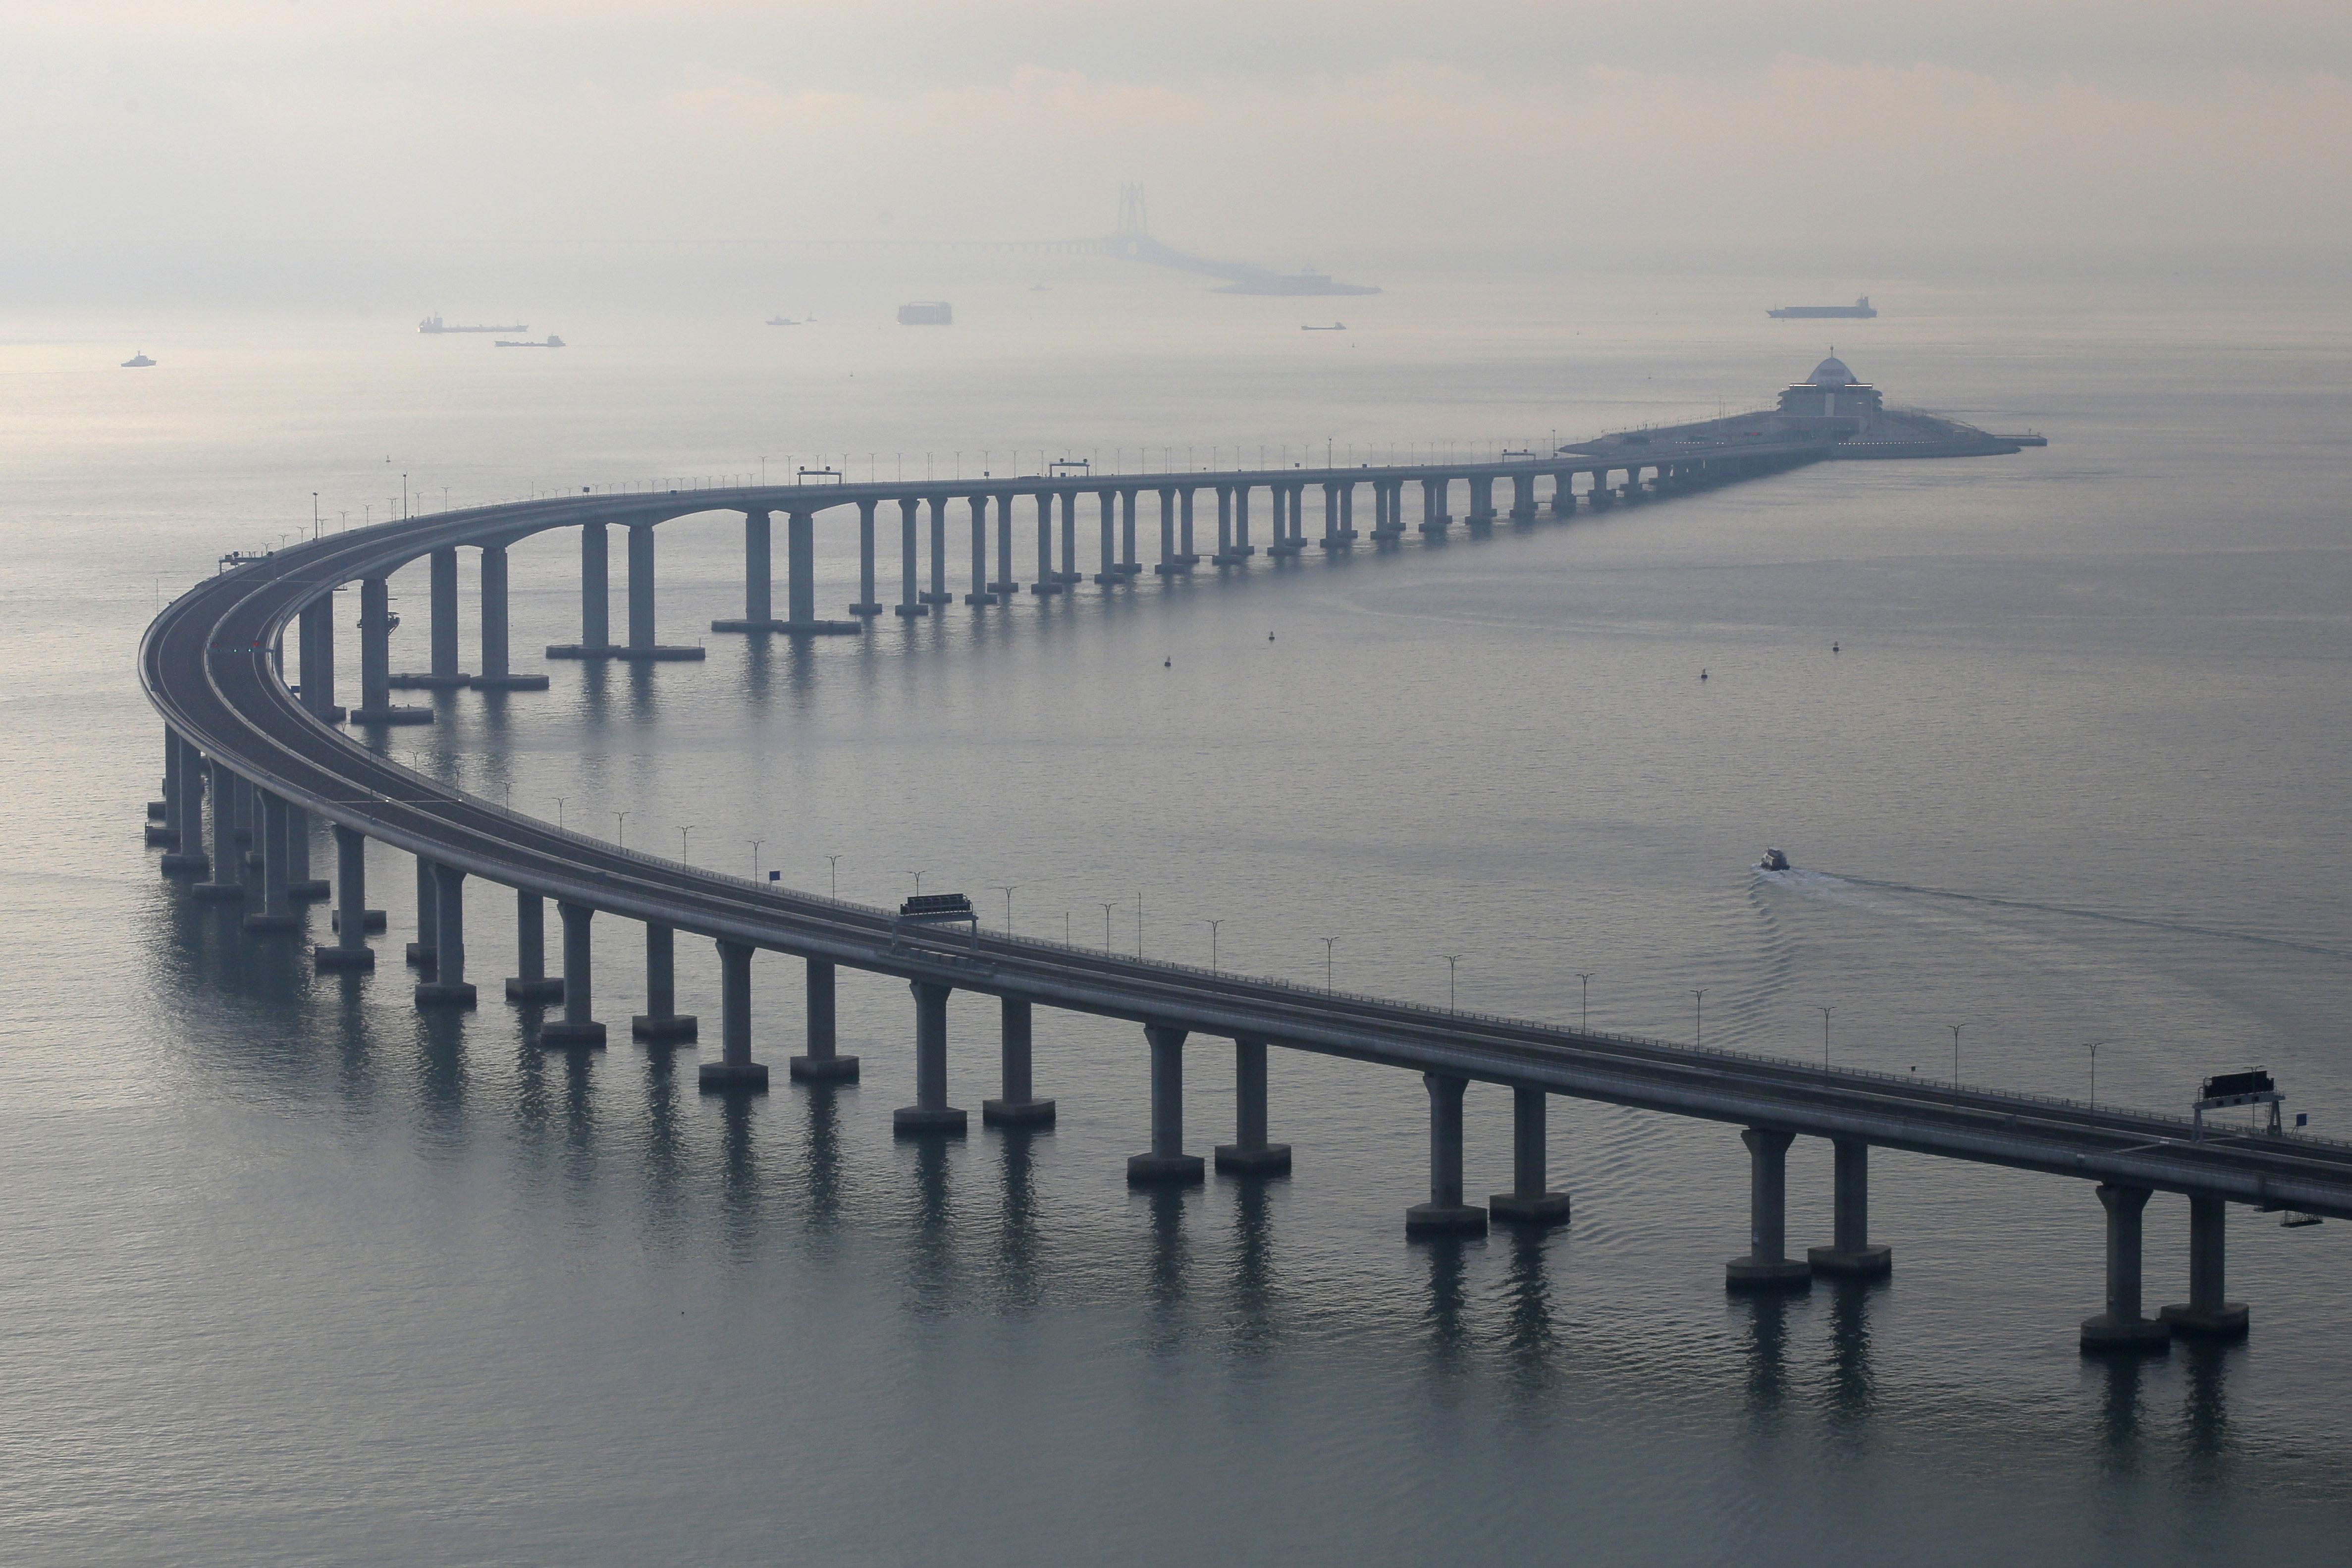 The 34-mile Hong Kong-Zhuhai-Macau bridge was officially opened on Tuesday.